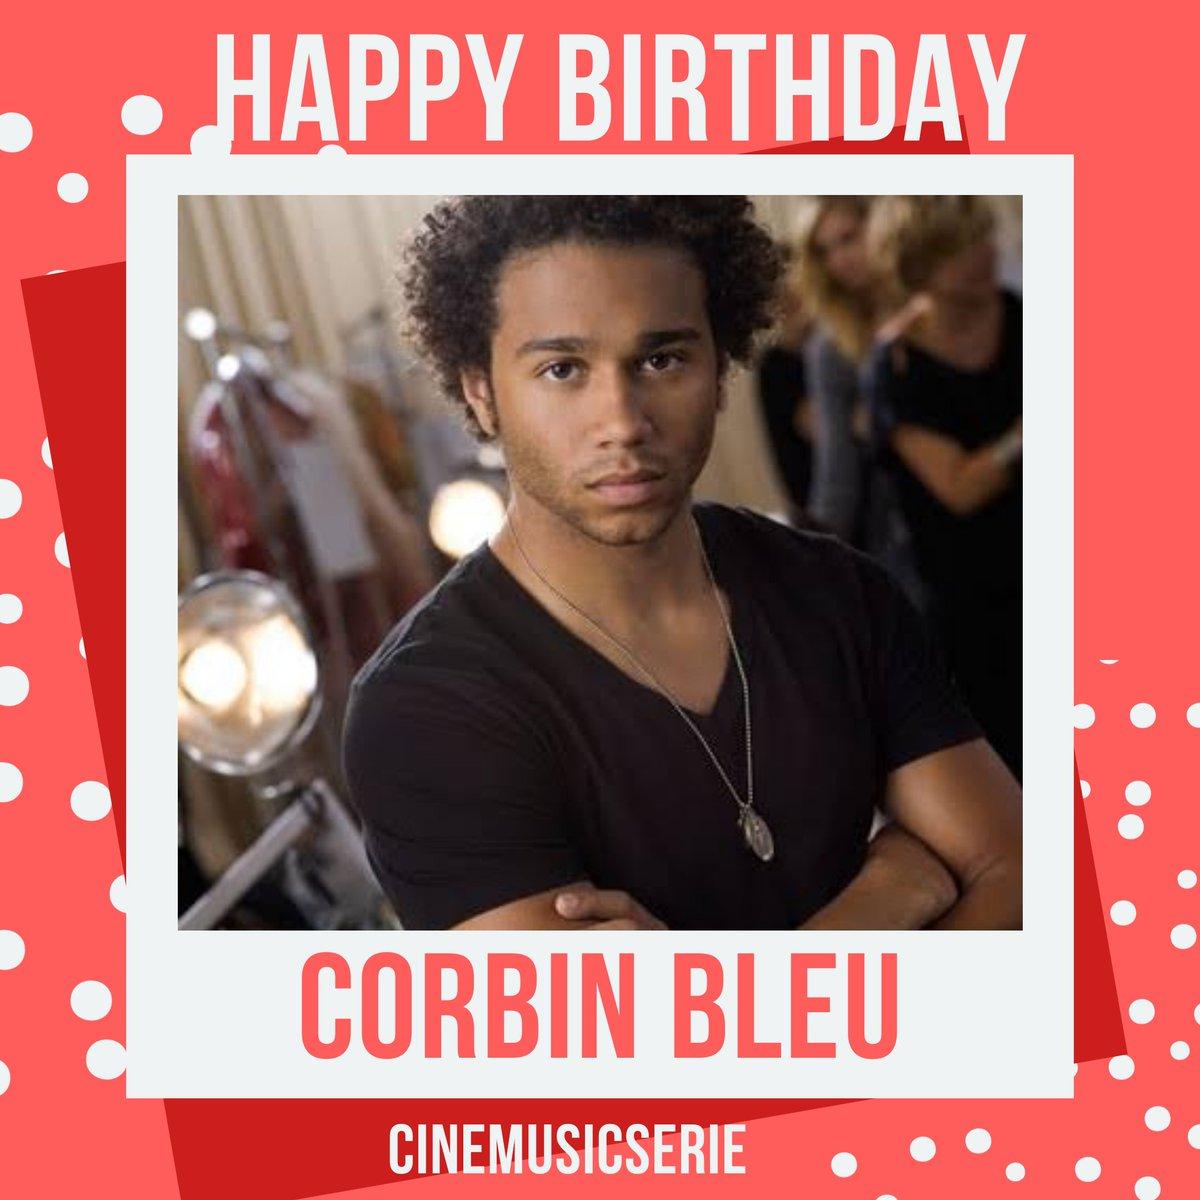 #HappyBirthday @corbinbleu